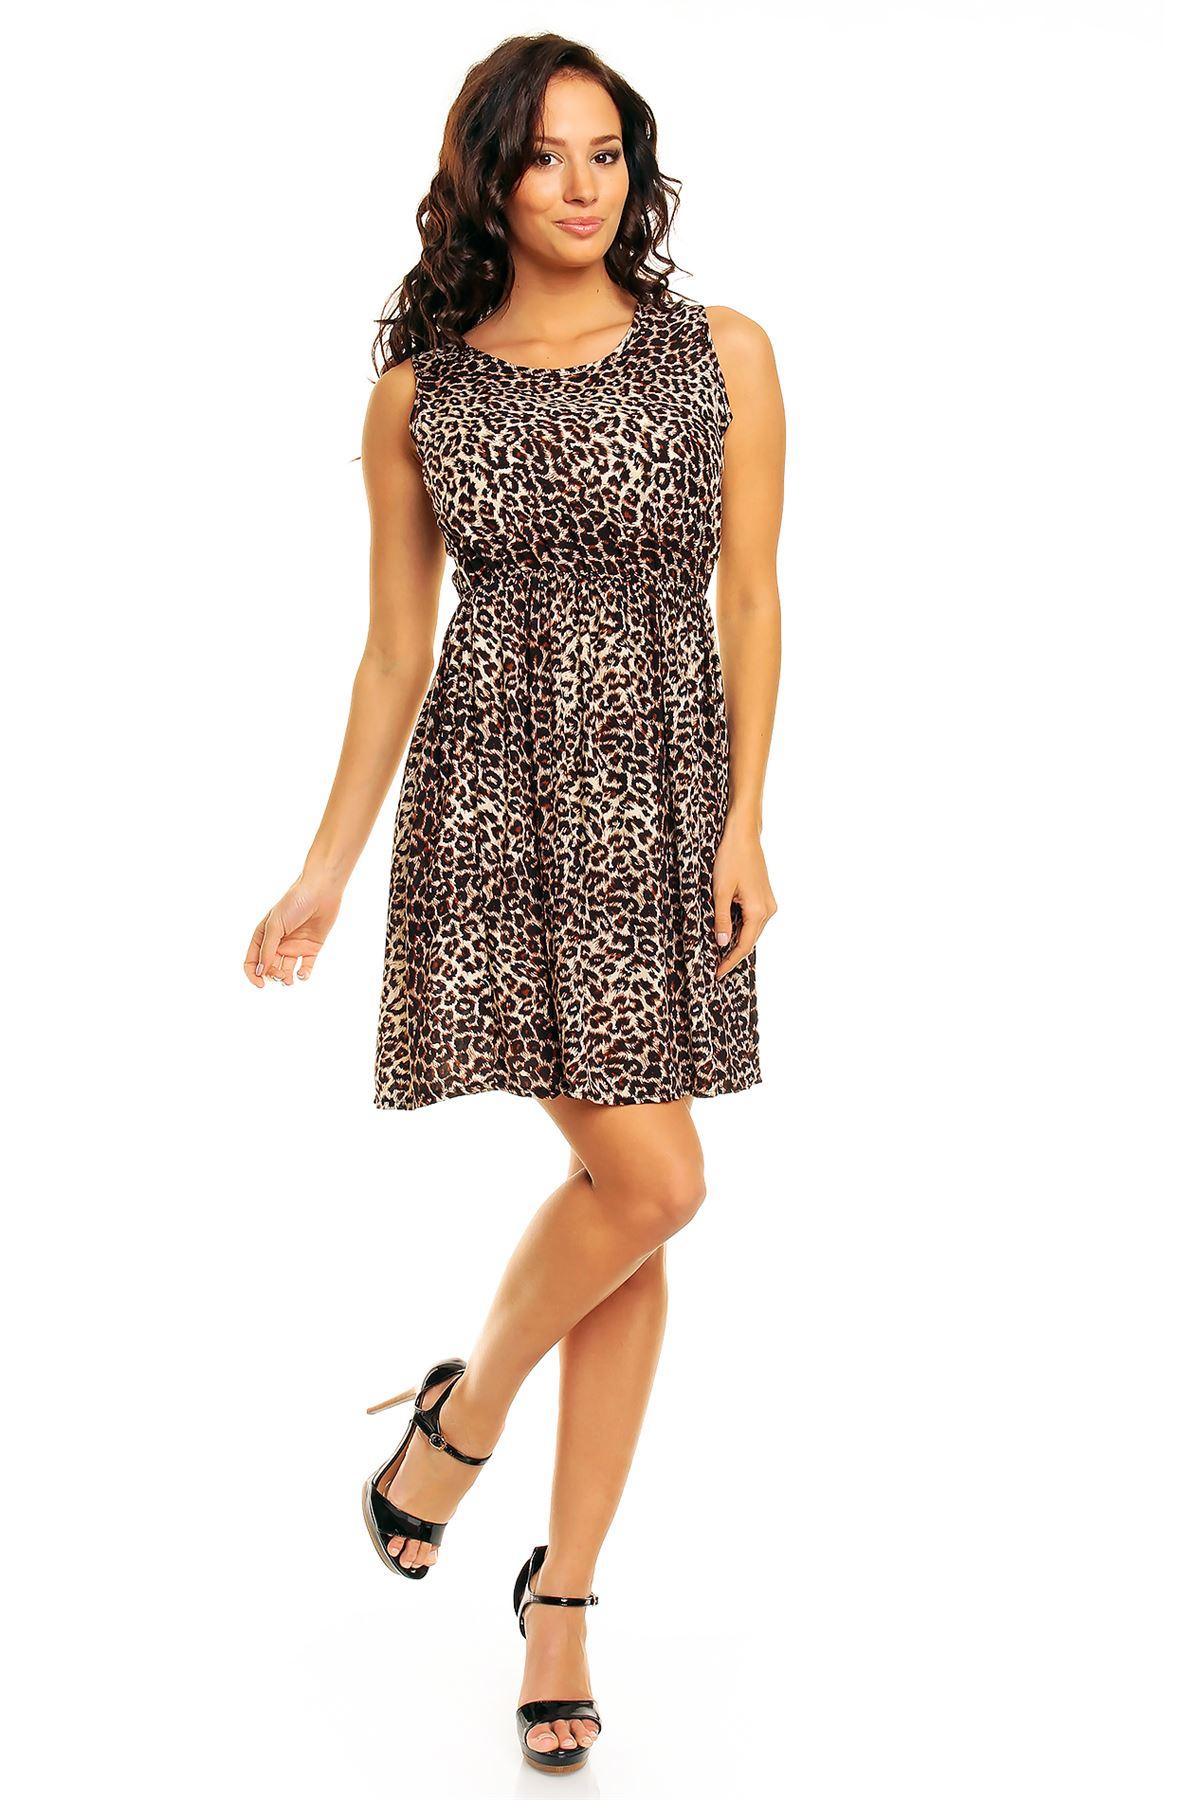 Ladies summer day dresses uk cheap